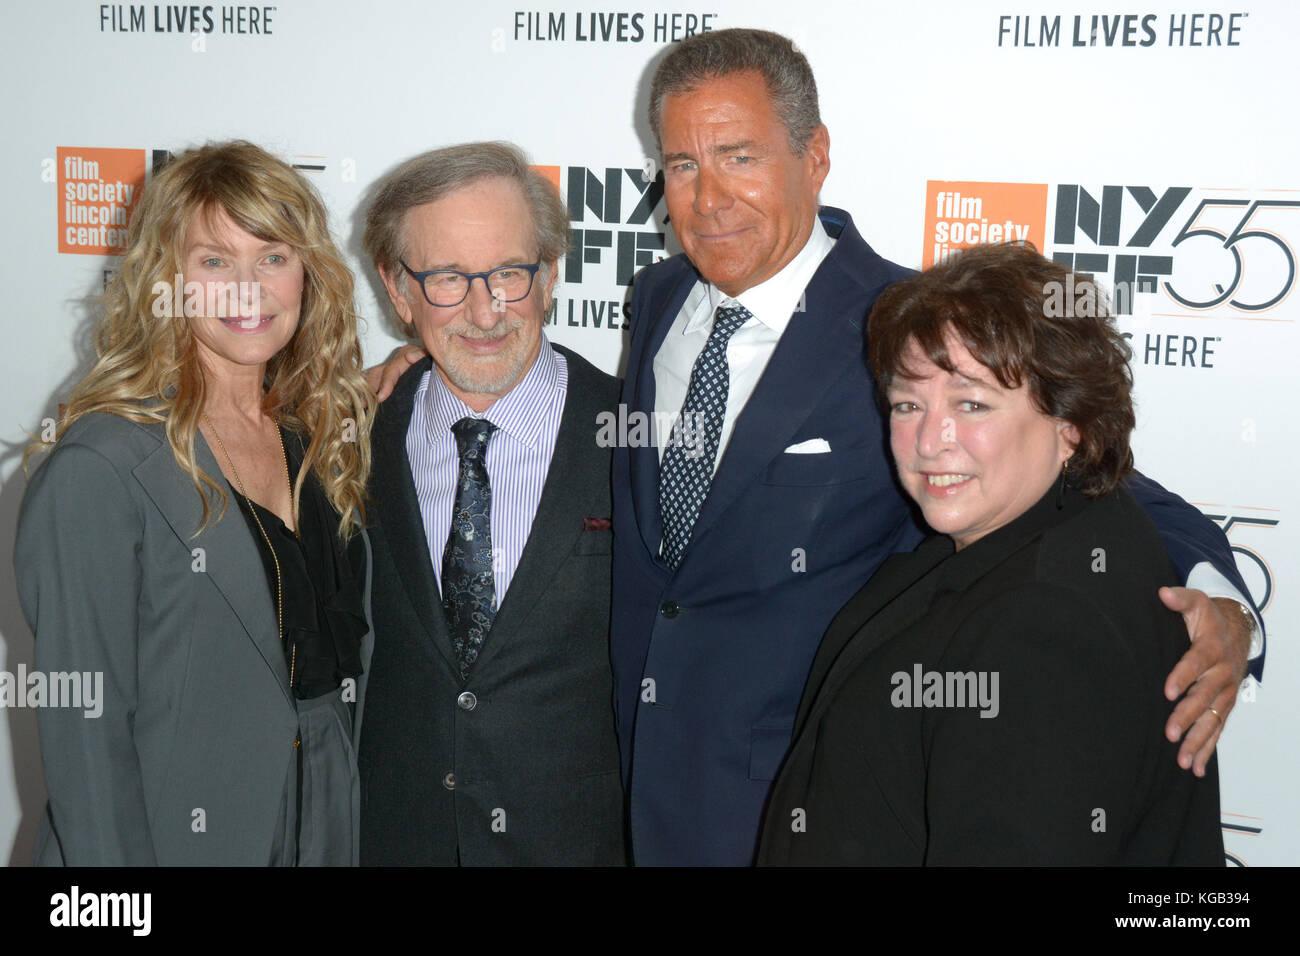 55th New York Film Festival Spielberg Premiere At Alice Tully